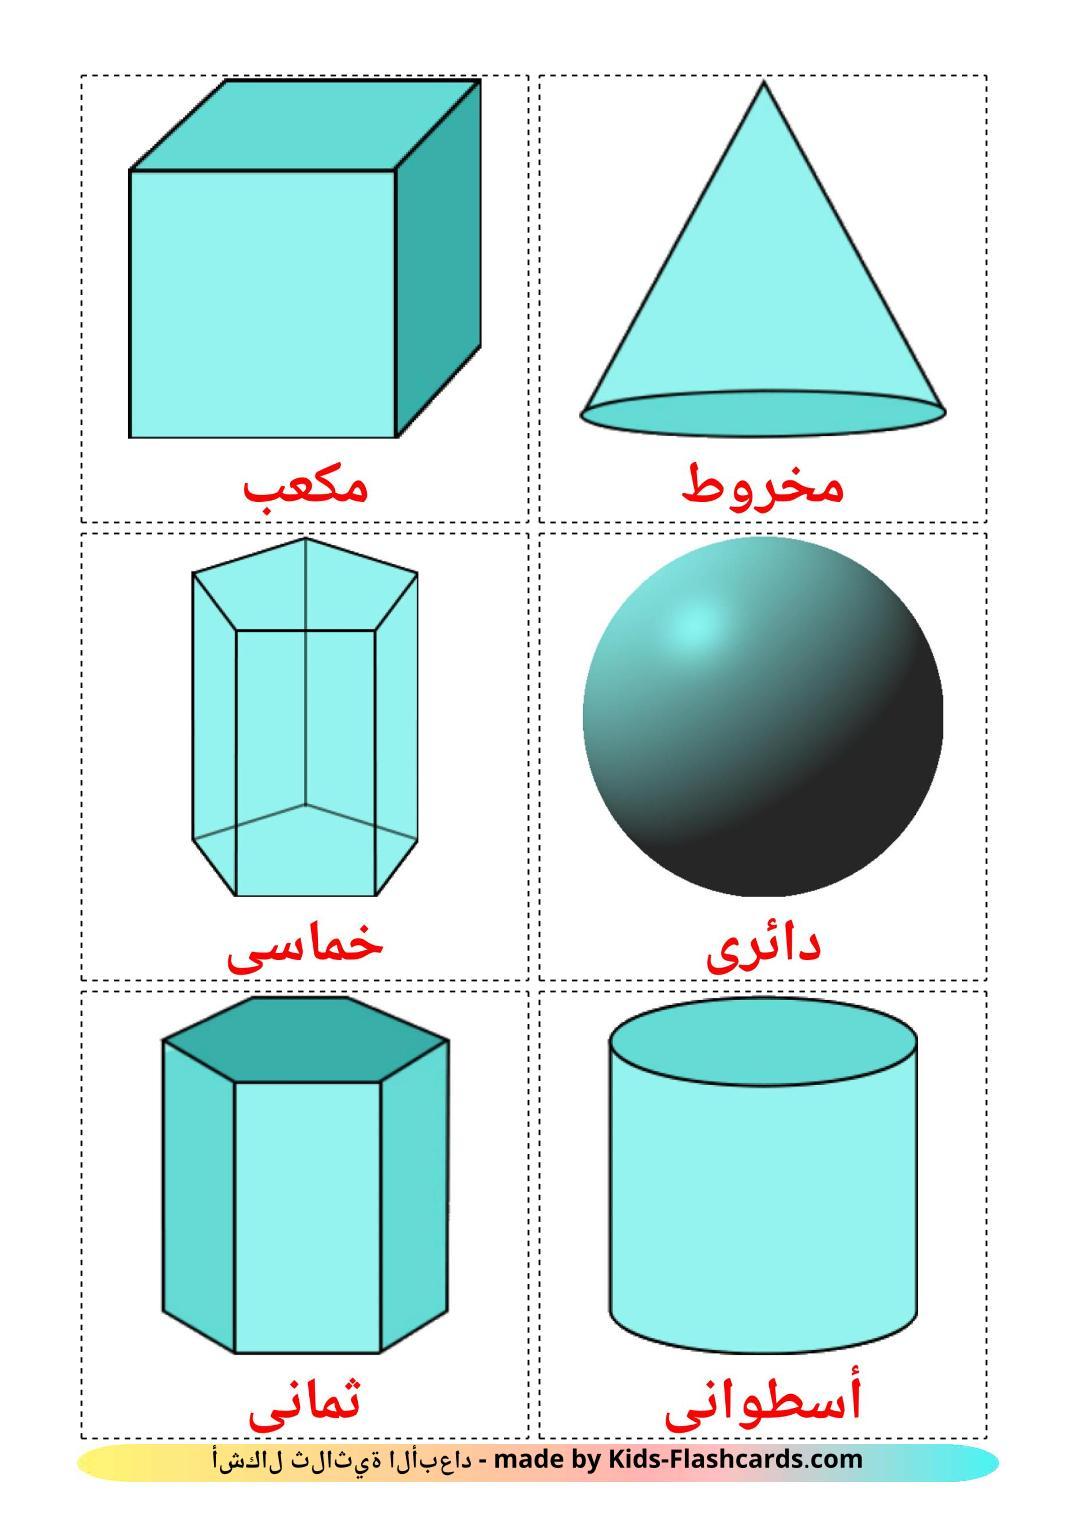 3D Shapes - 17 Free Printable arabic Flashcards